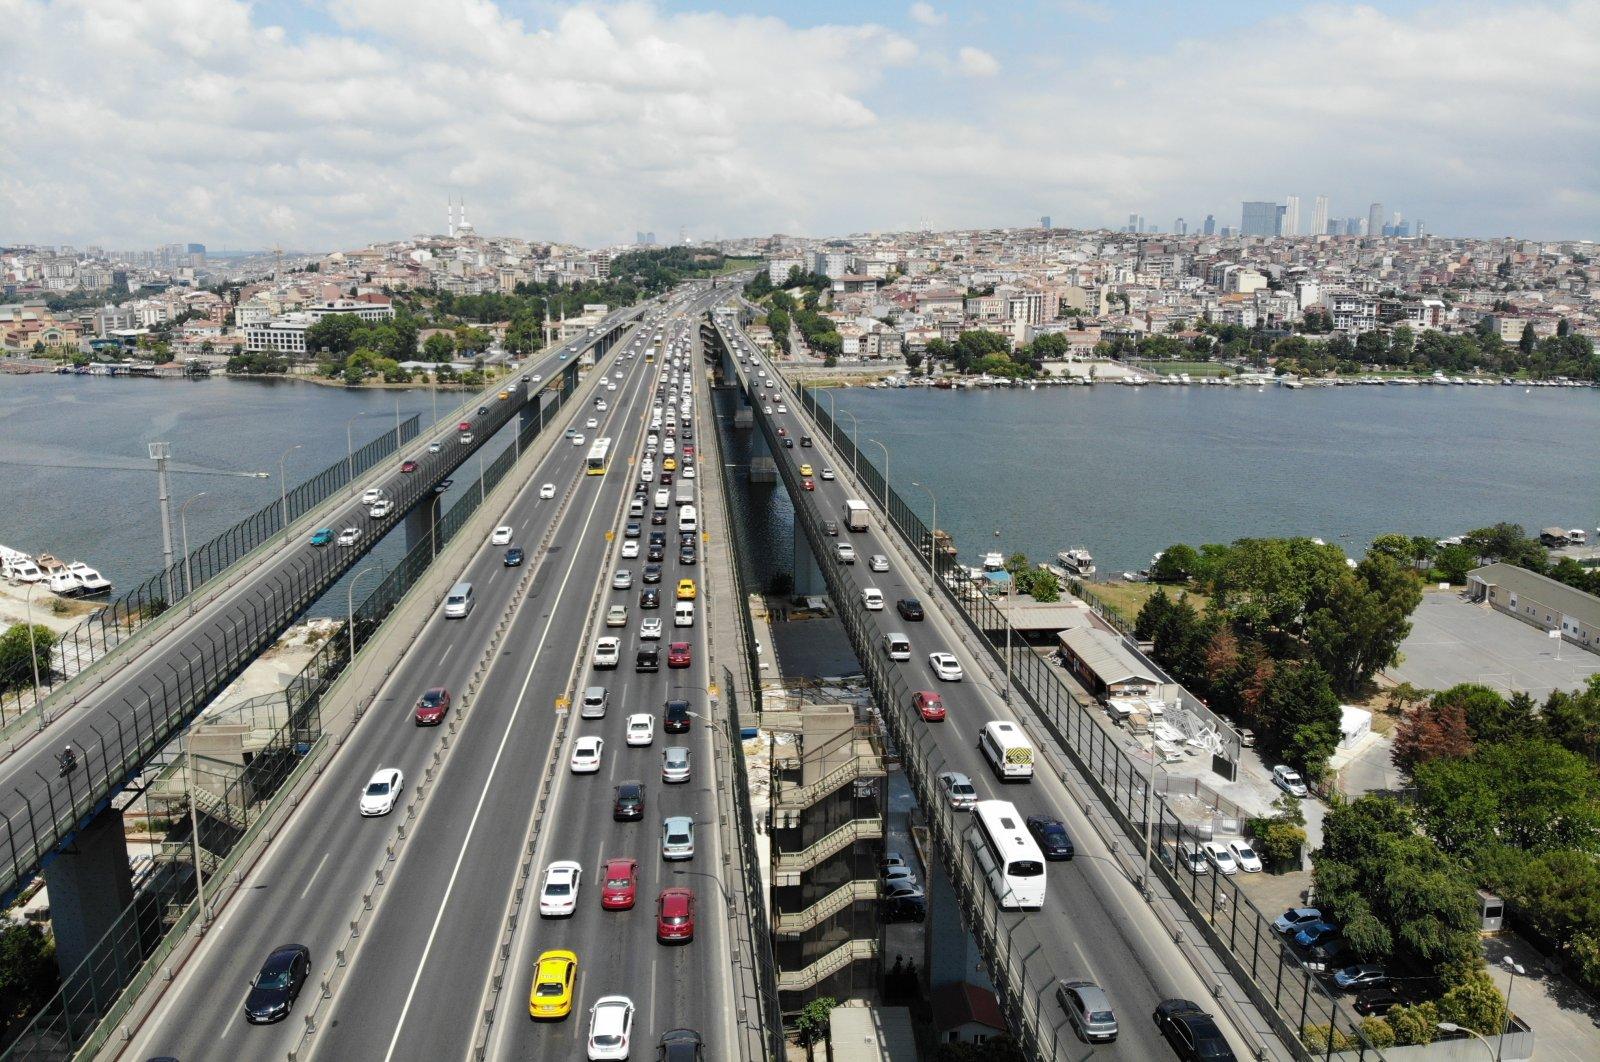 Cars are seen on the Haliç Bridge in Istanbul, Turkey, July 19, 2020. (IHA Photo)